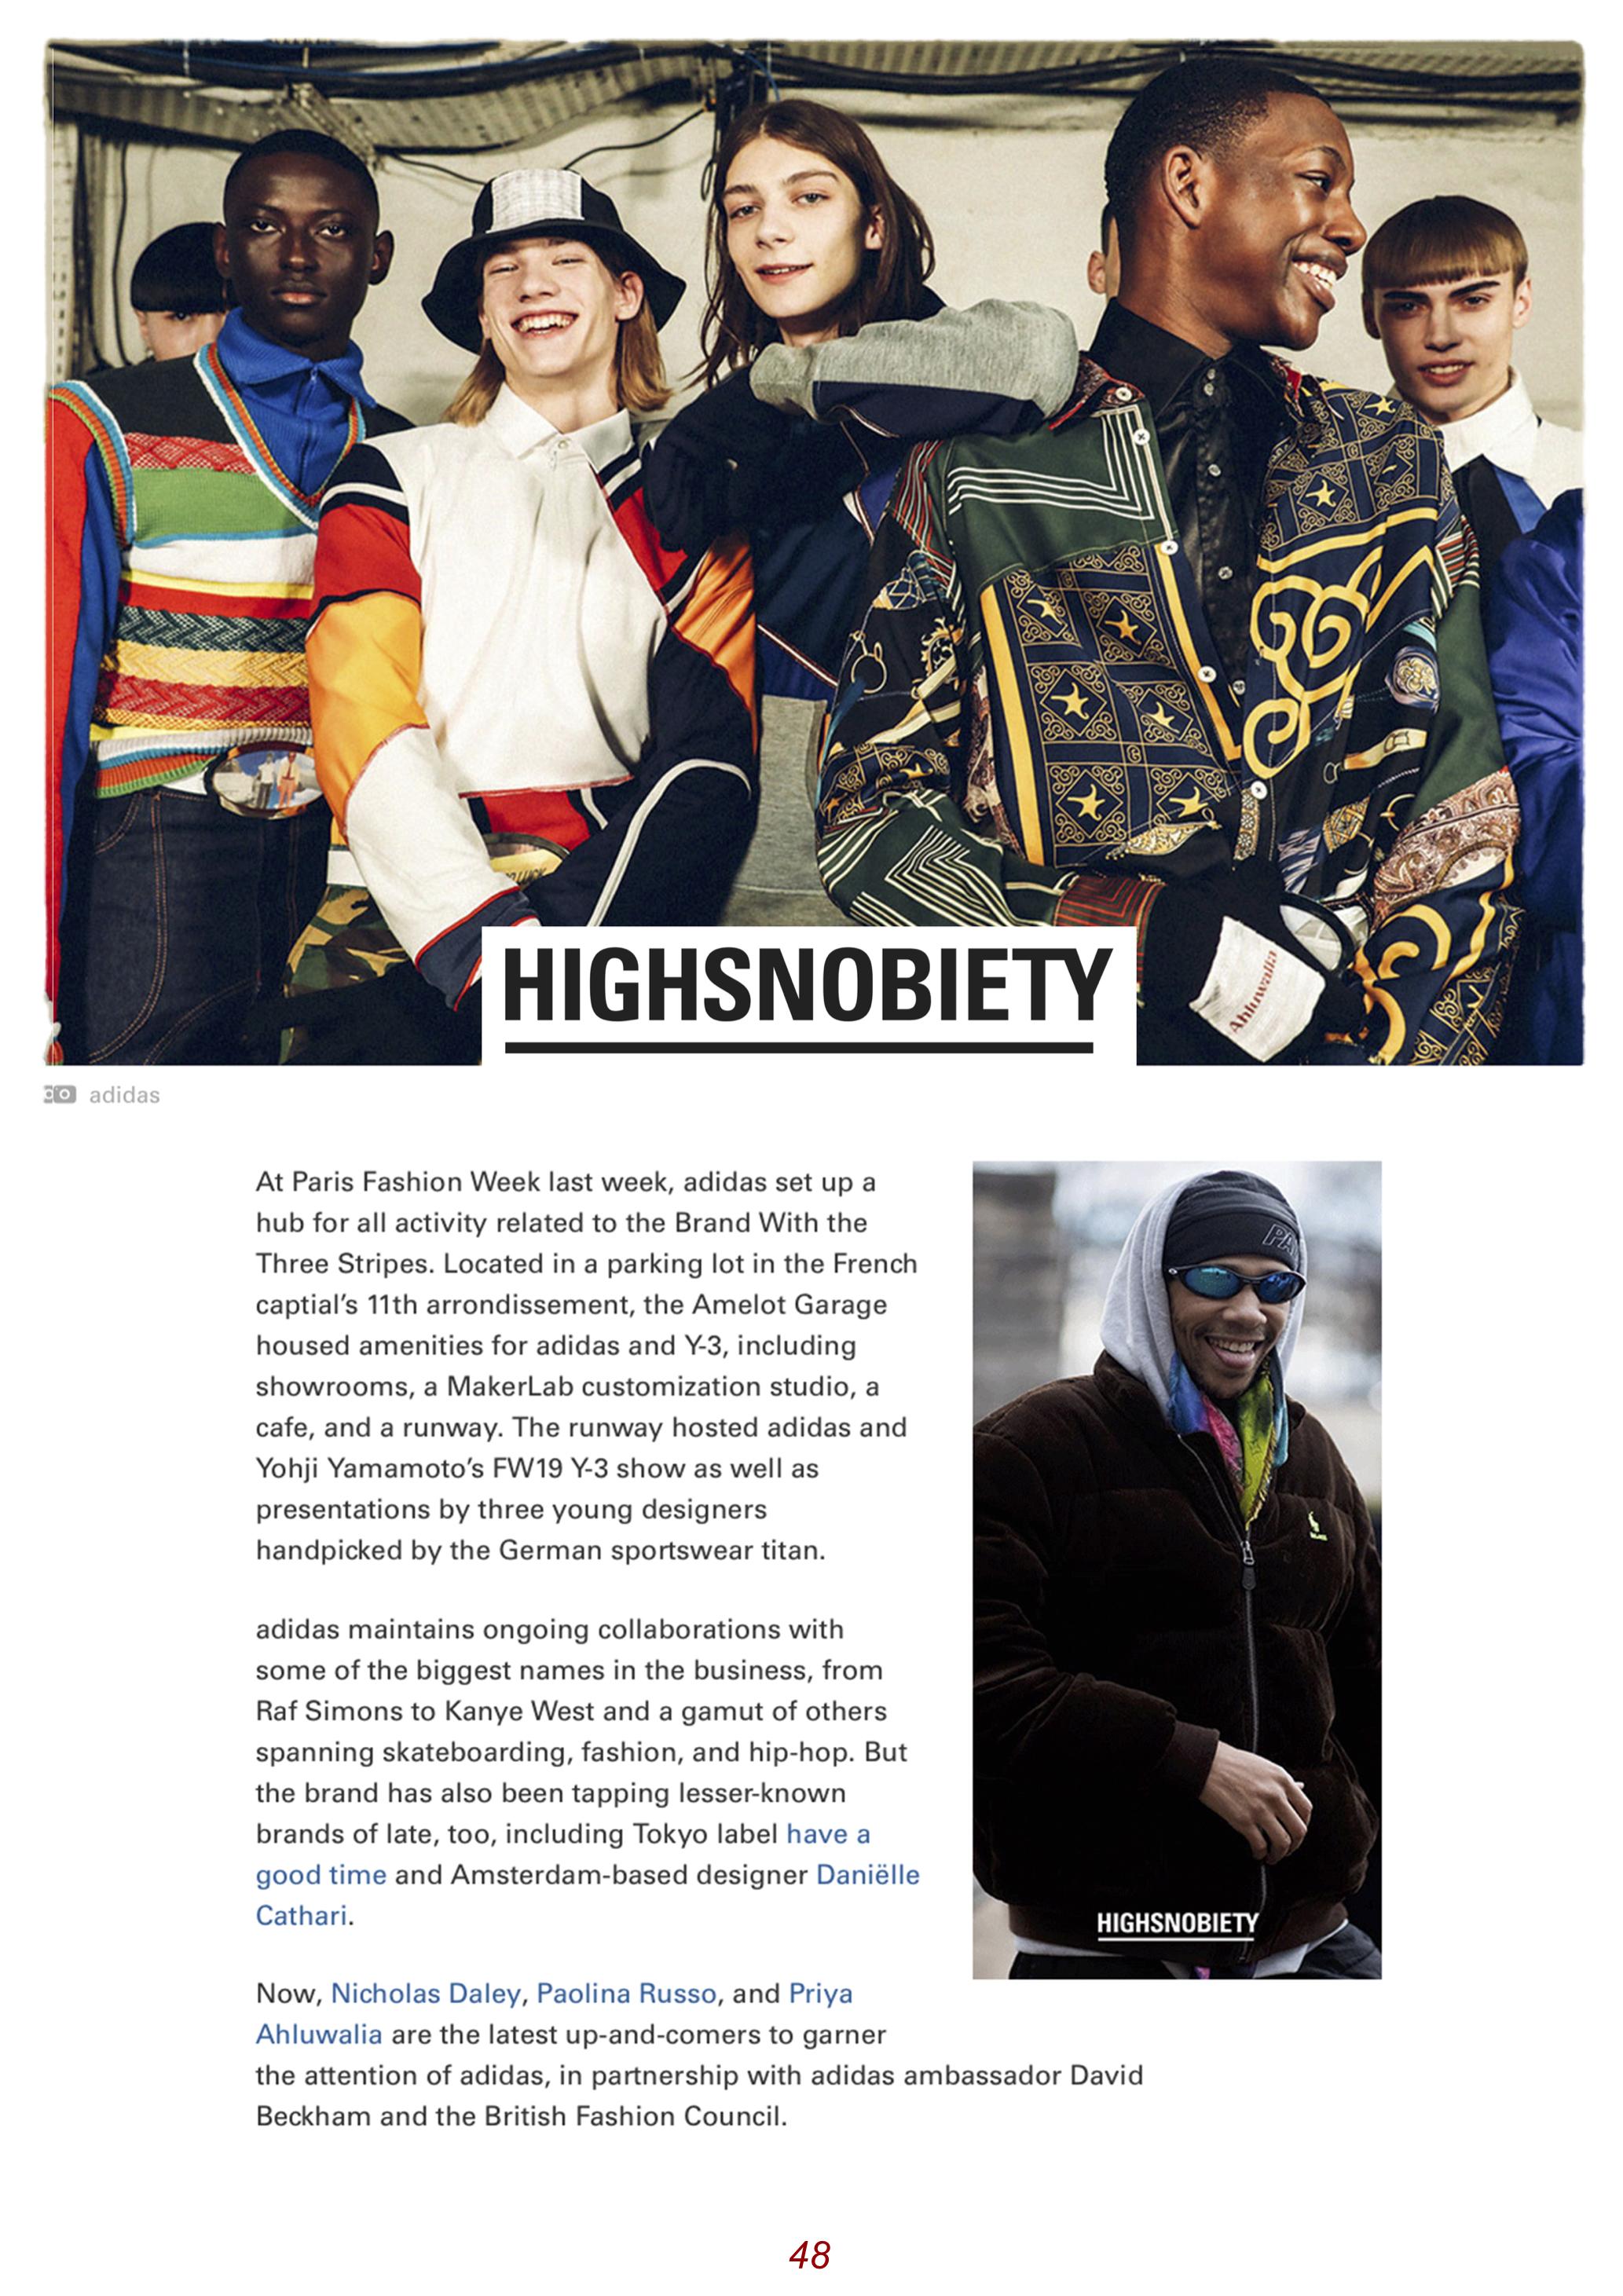 page 48 photo.jpg